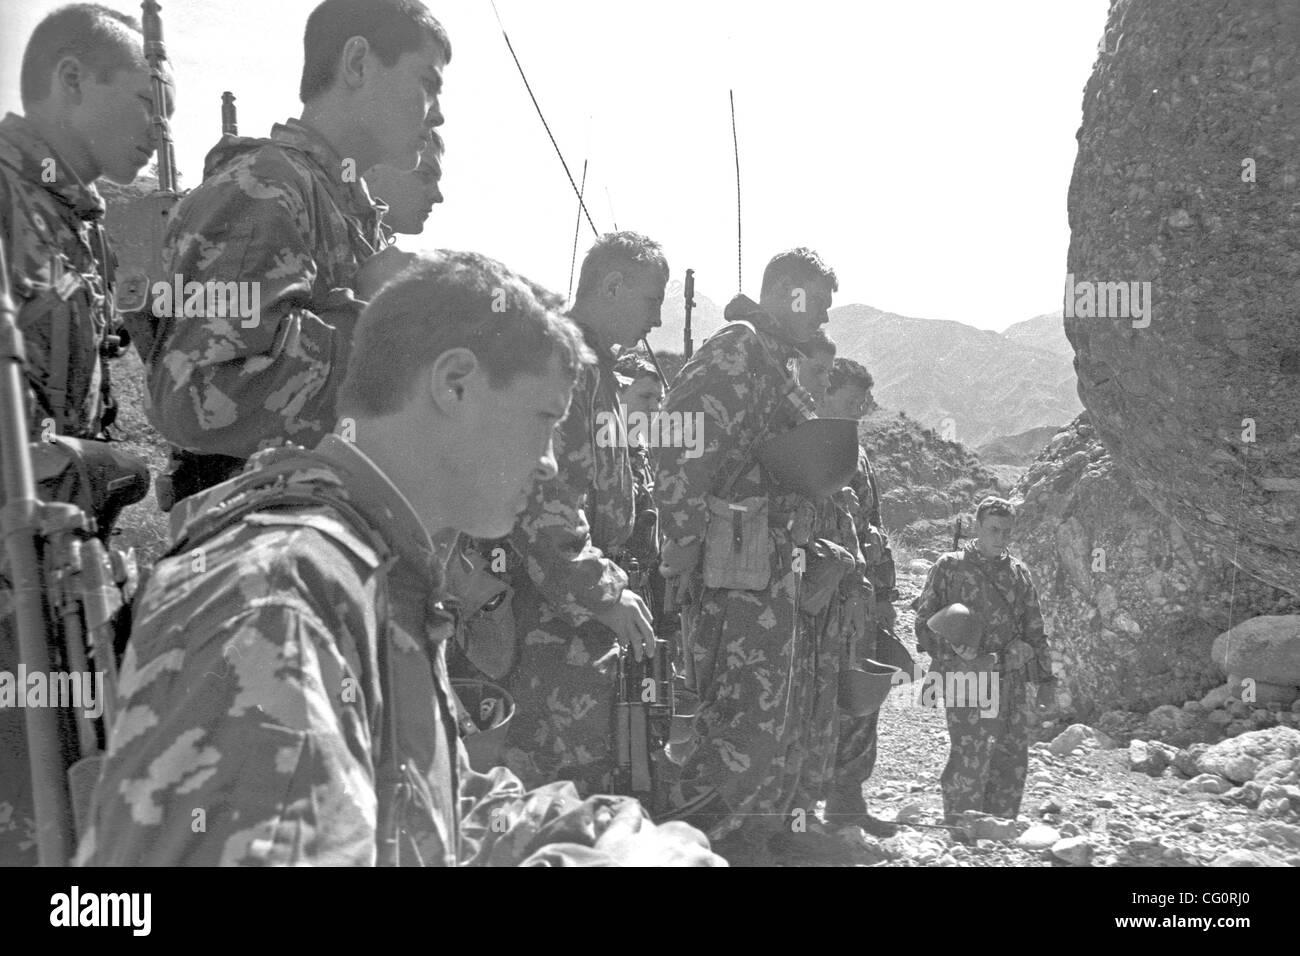 Soviet Afghanistan war - Page 6 Jul-12-2007-kabul-afghanistan-the-soviet-war-in-afghanistan-was-a-CG0RJ0